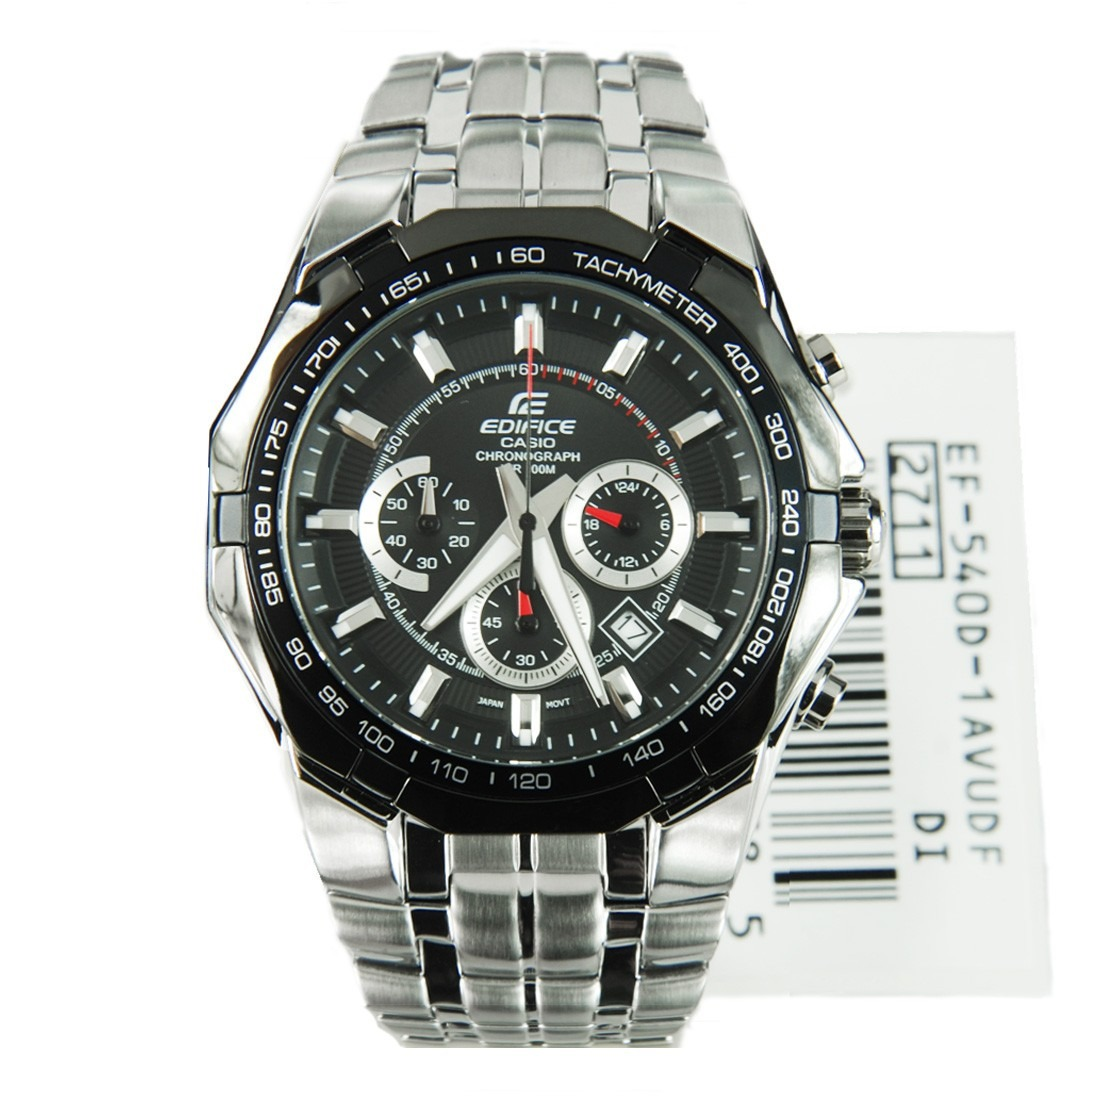 3c2e1b1a07aa Reloj Casio Edifice Ef 540d 1a Cronógrafo Acero Original -   319.900 ...